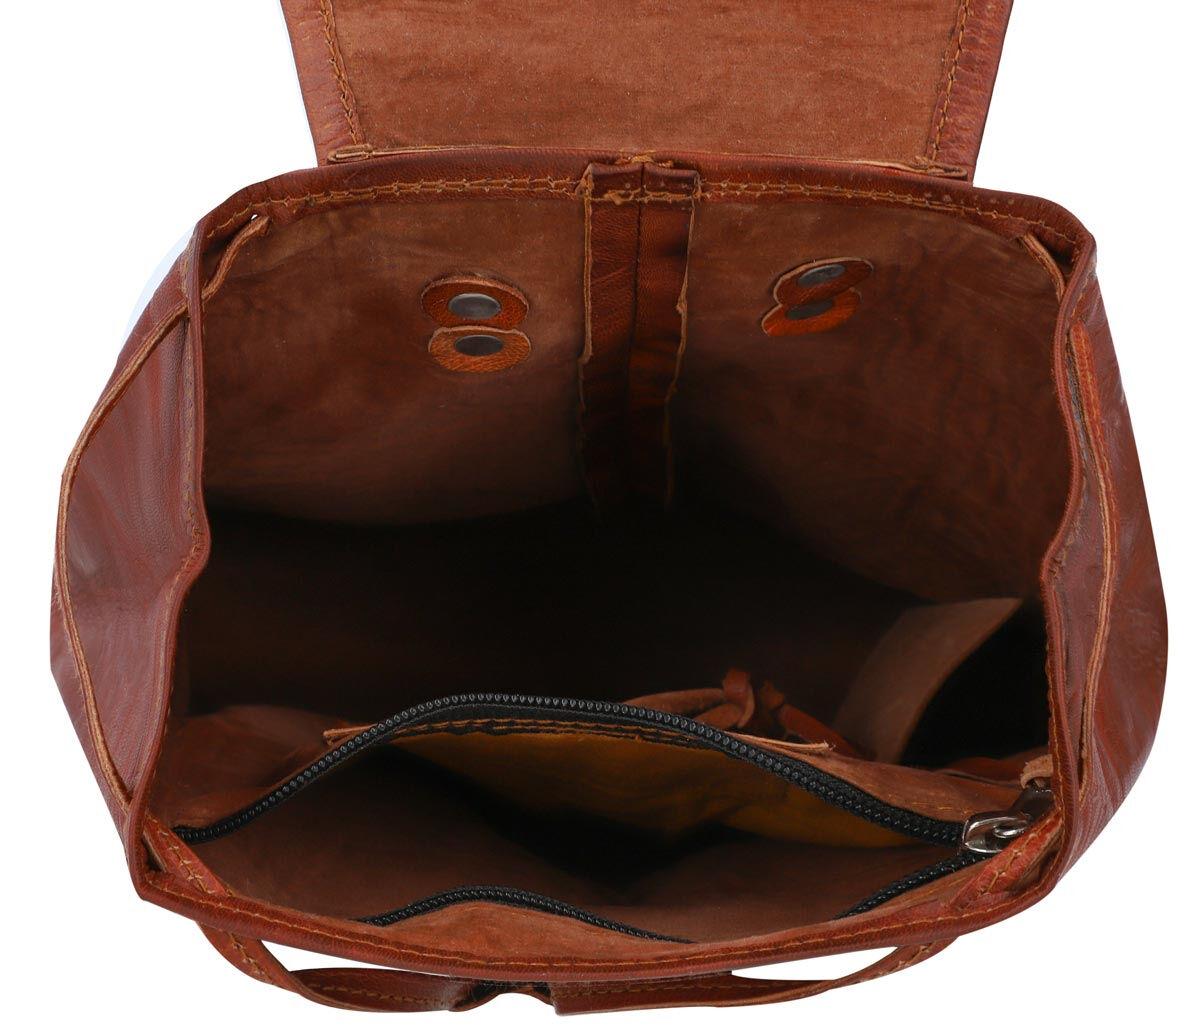 Outlet Rucksack - kleinere Lederfehler - faltiges Leder - Klebereste - ansonsten neu – siehe Video